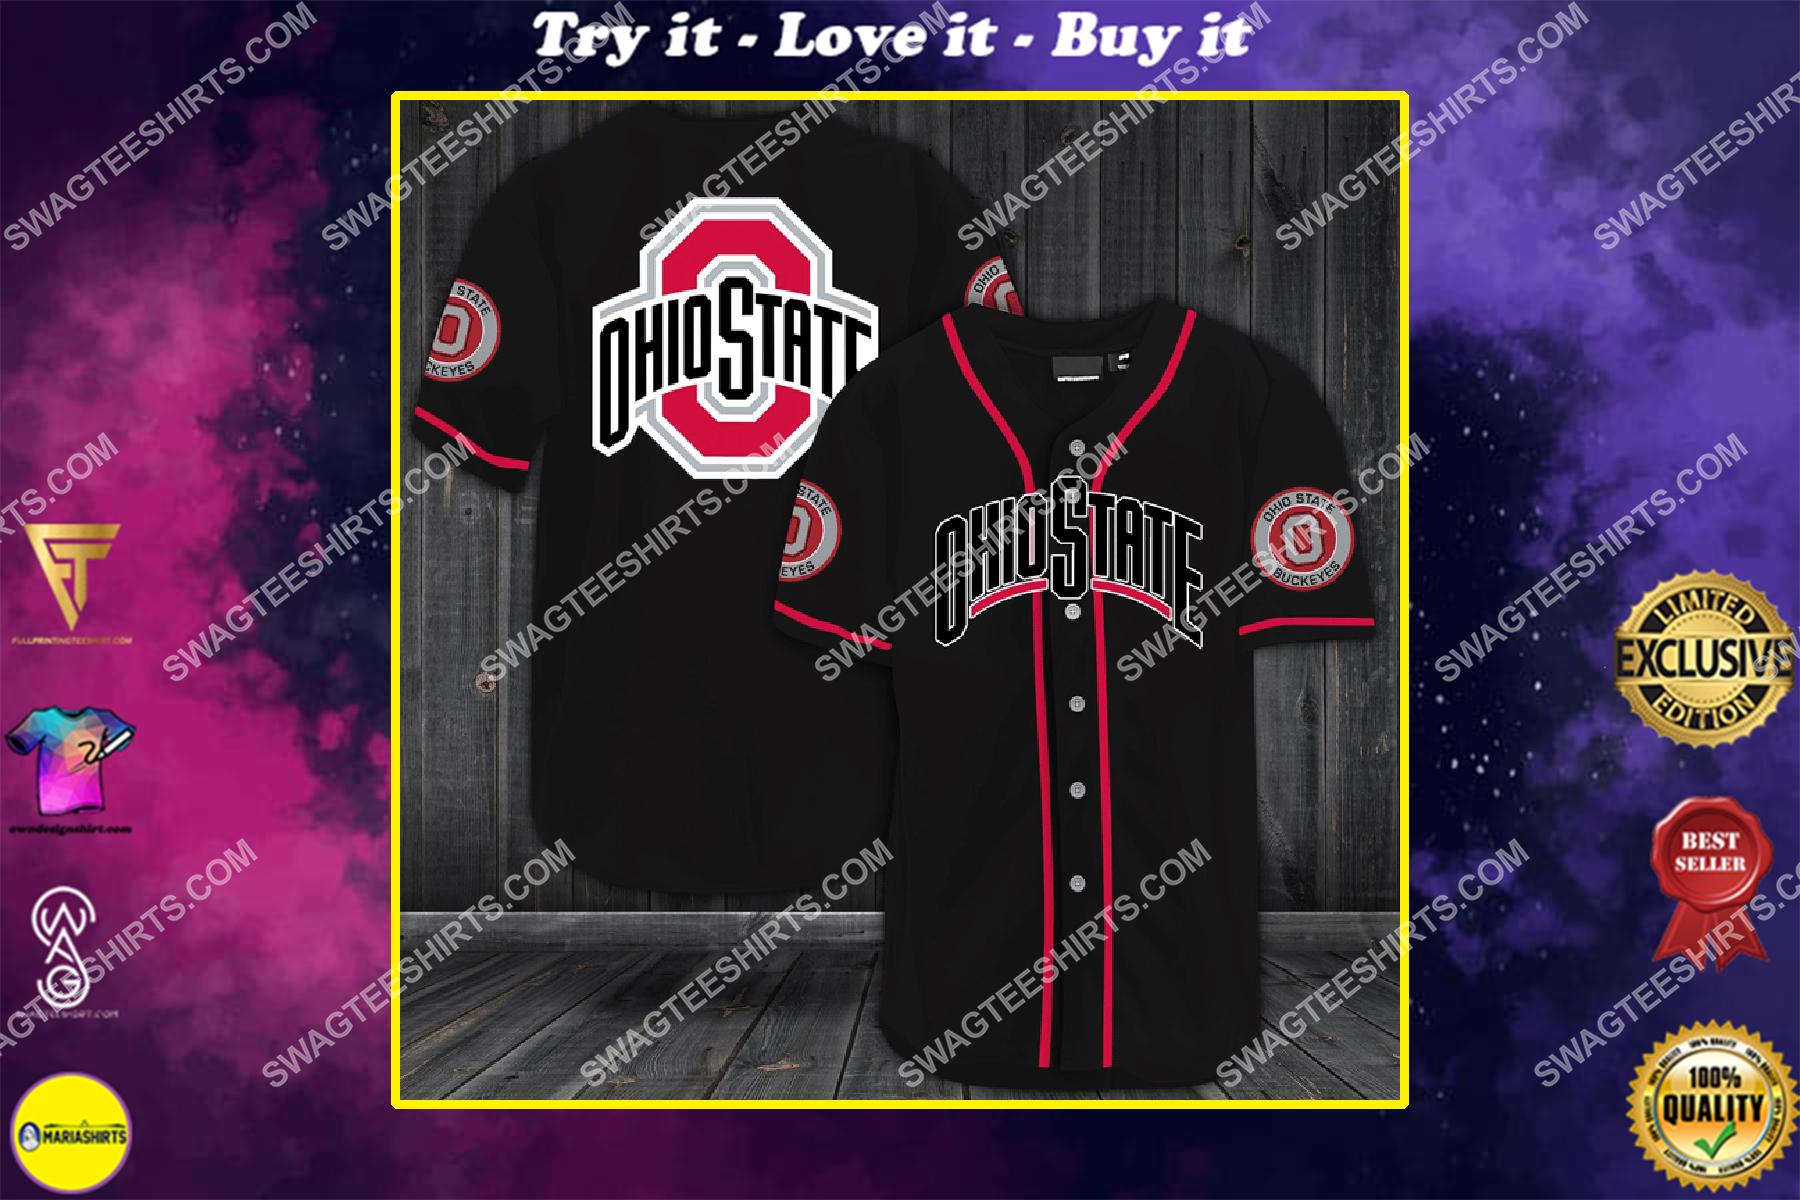 the ohio state buckeyes football team full printing baseball jersey